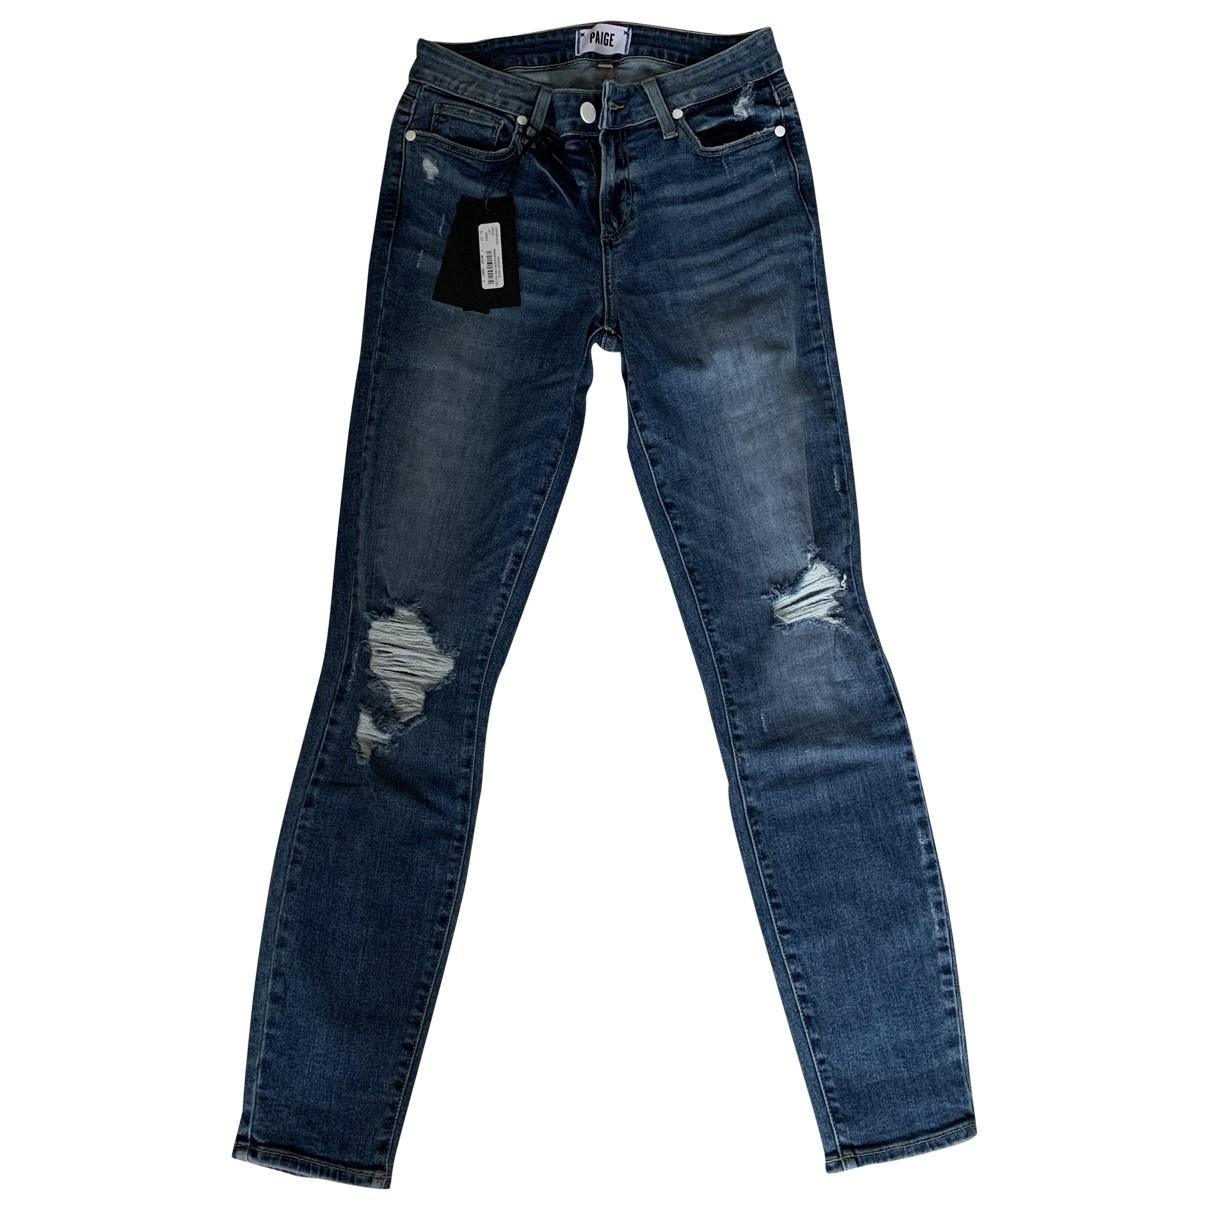 Paige Jeans \N Jeans in  Blau Denim - Jeans